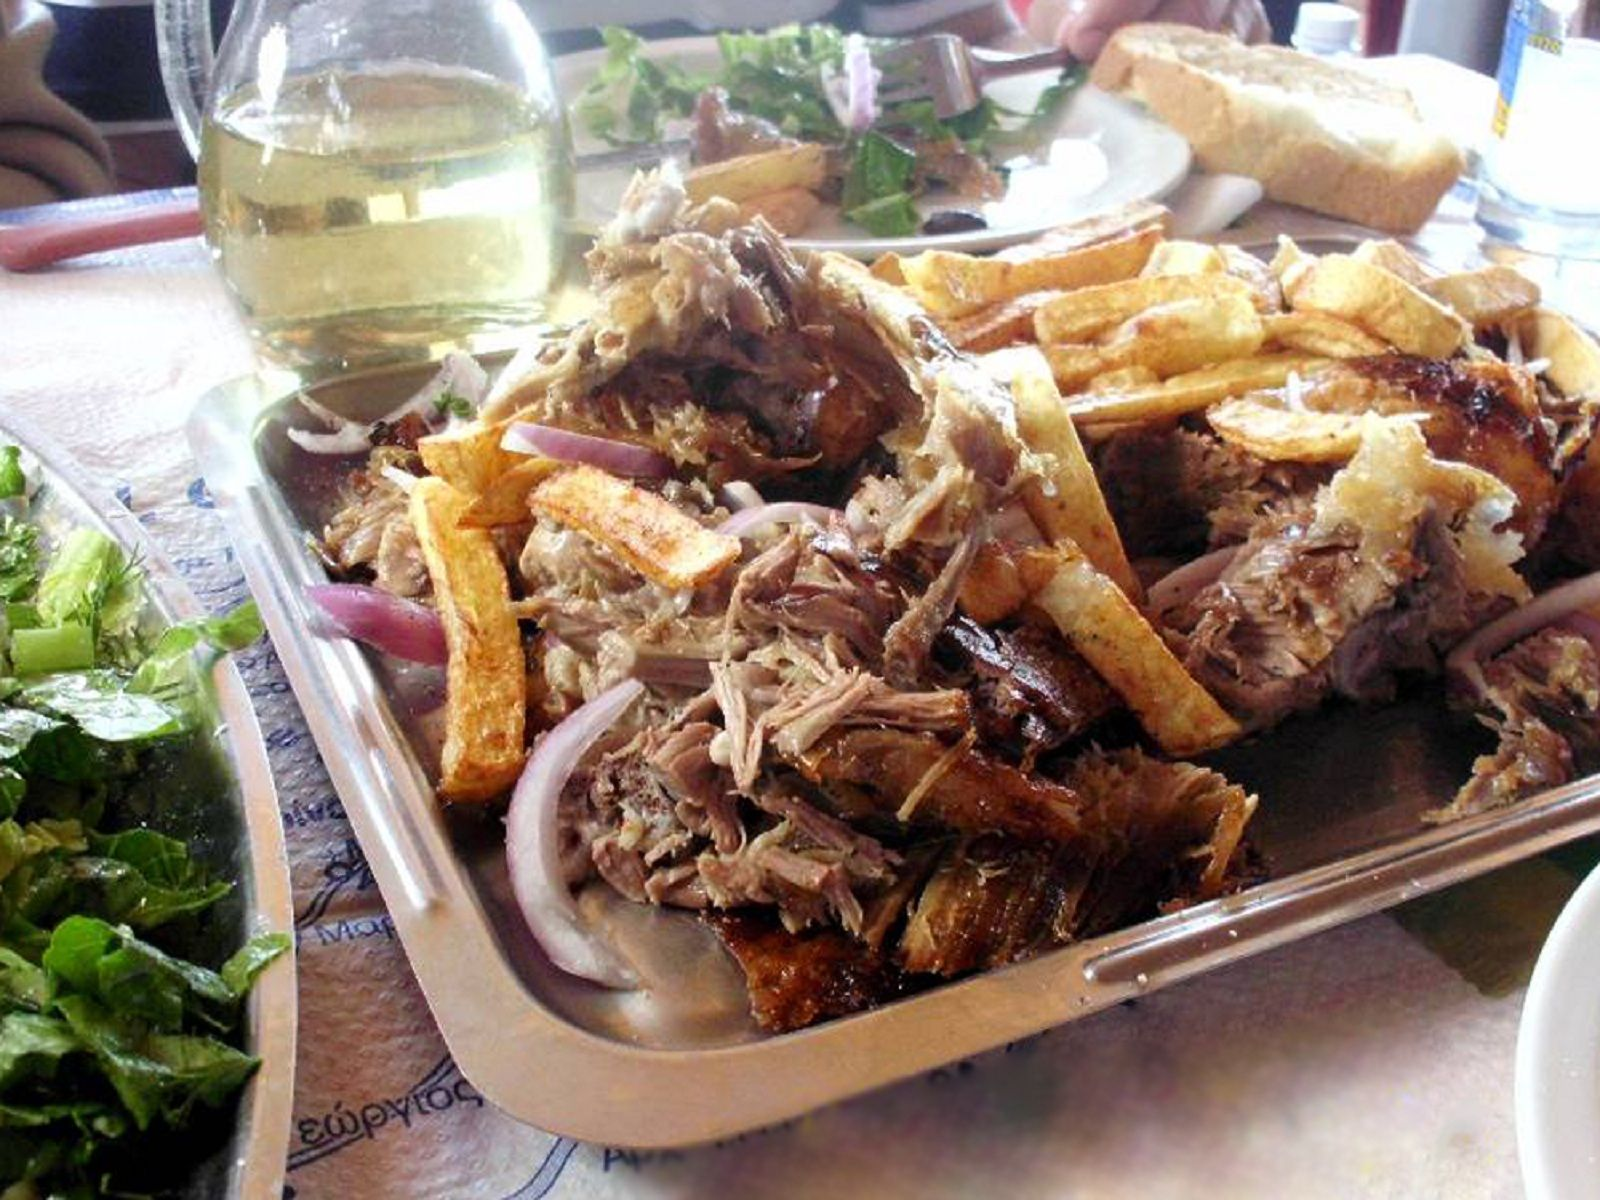 Carne de miel la Protap, Taverna Stelios - Theologos